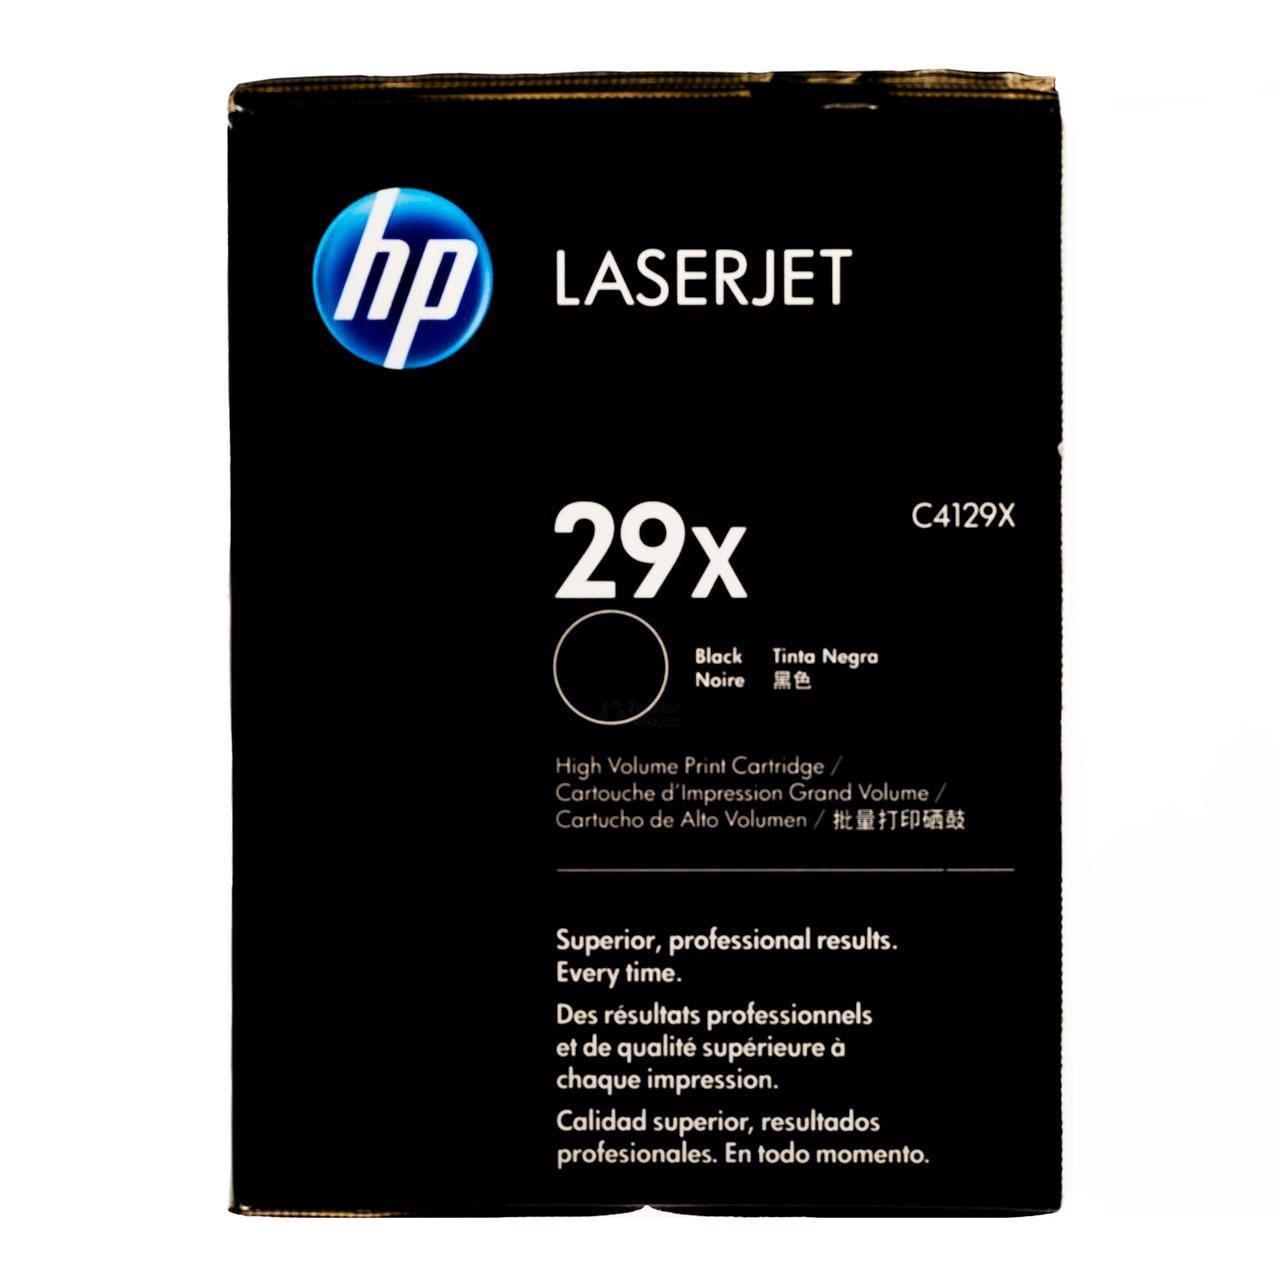 2 Pack C4129X 29X Toner Cartridge for HP Laserjet 5000n 5100dtn 5100tn Printer